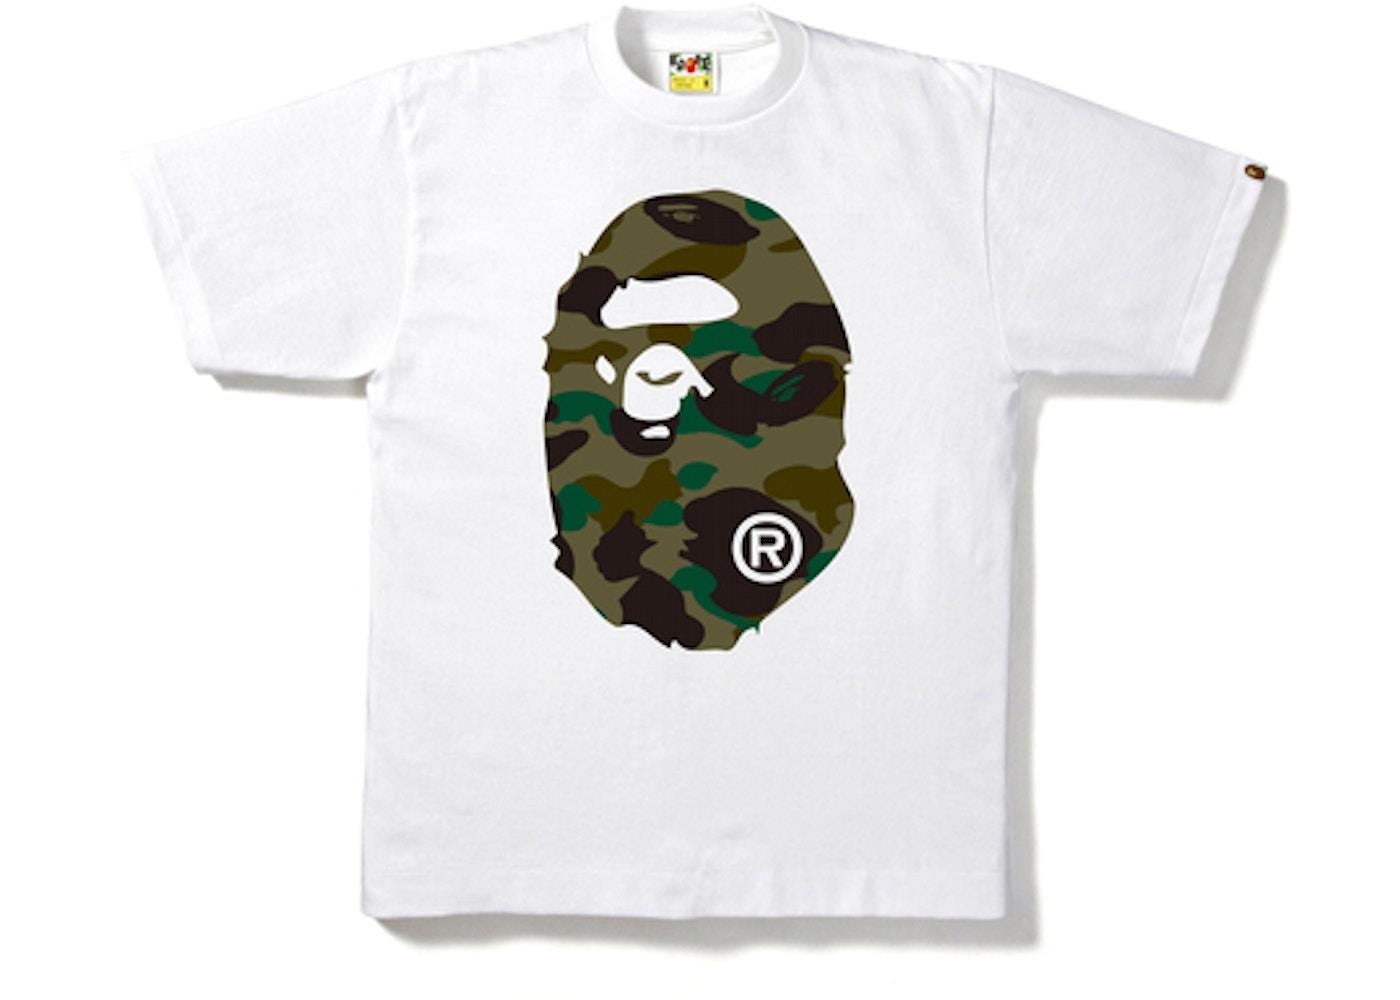 824682e01804 BAPE 1st Camo Big Ape Head Tee White Green -